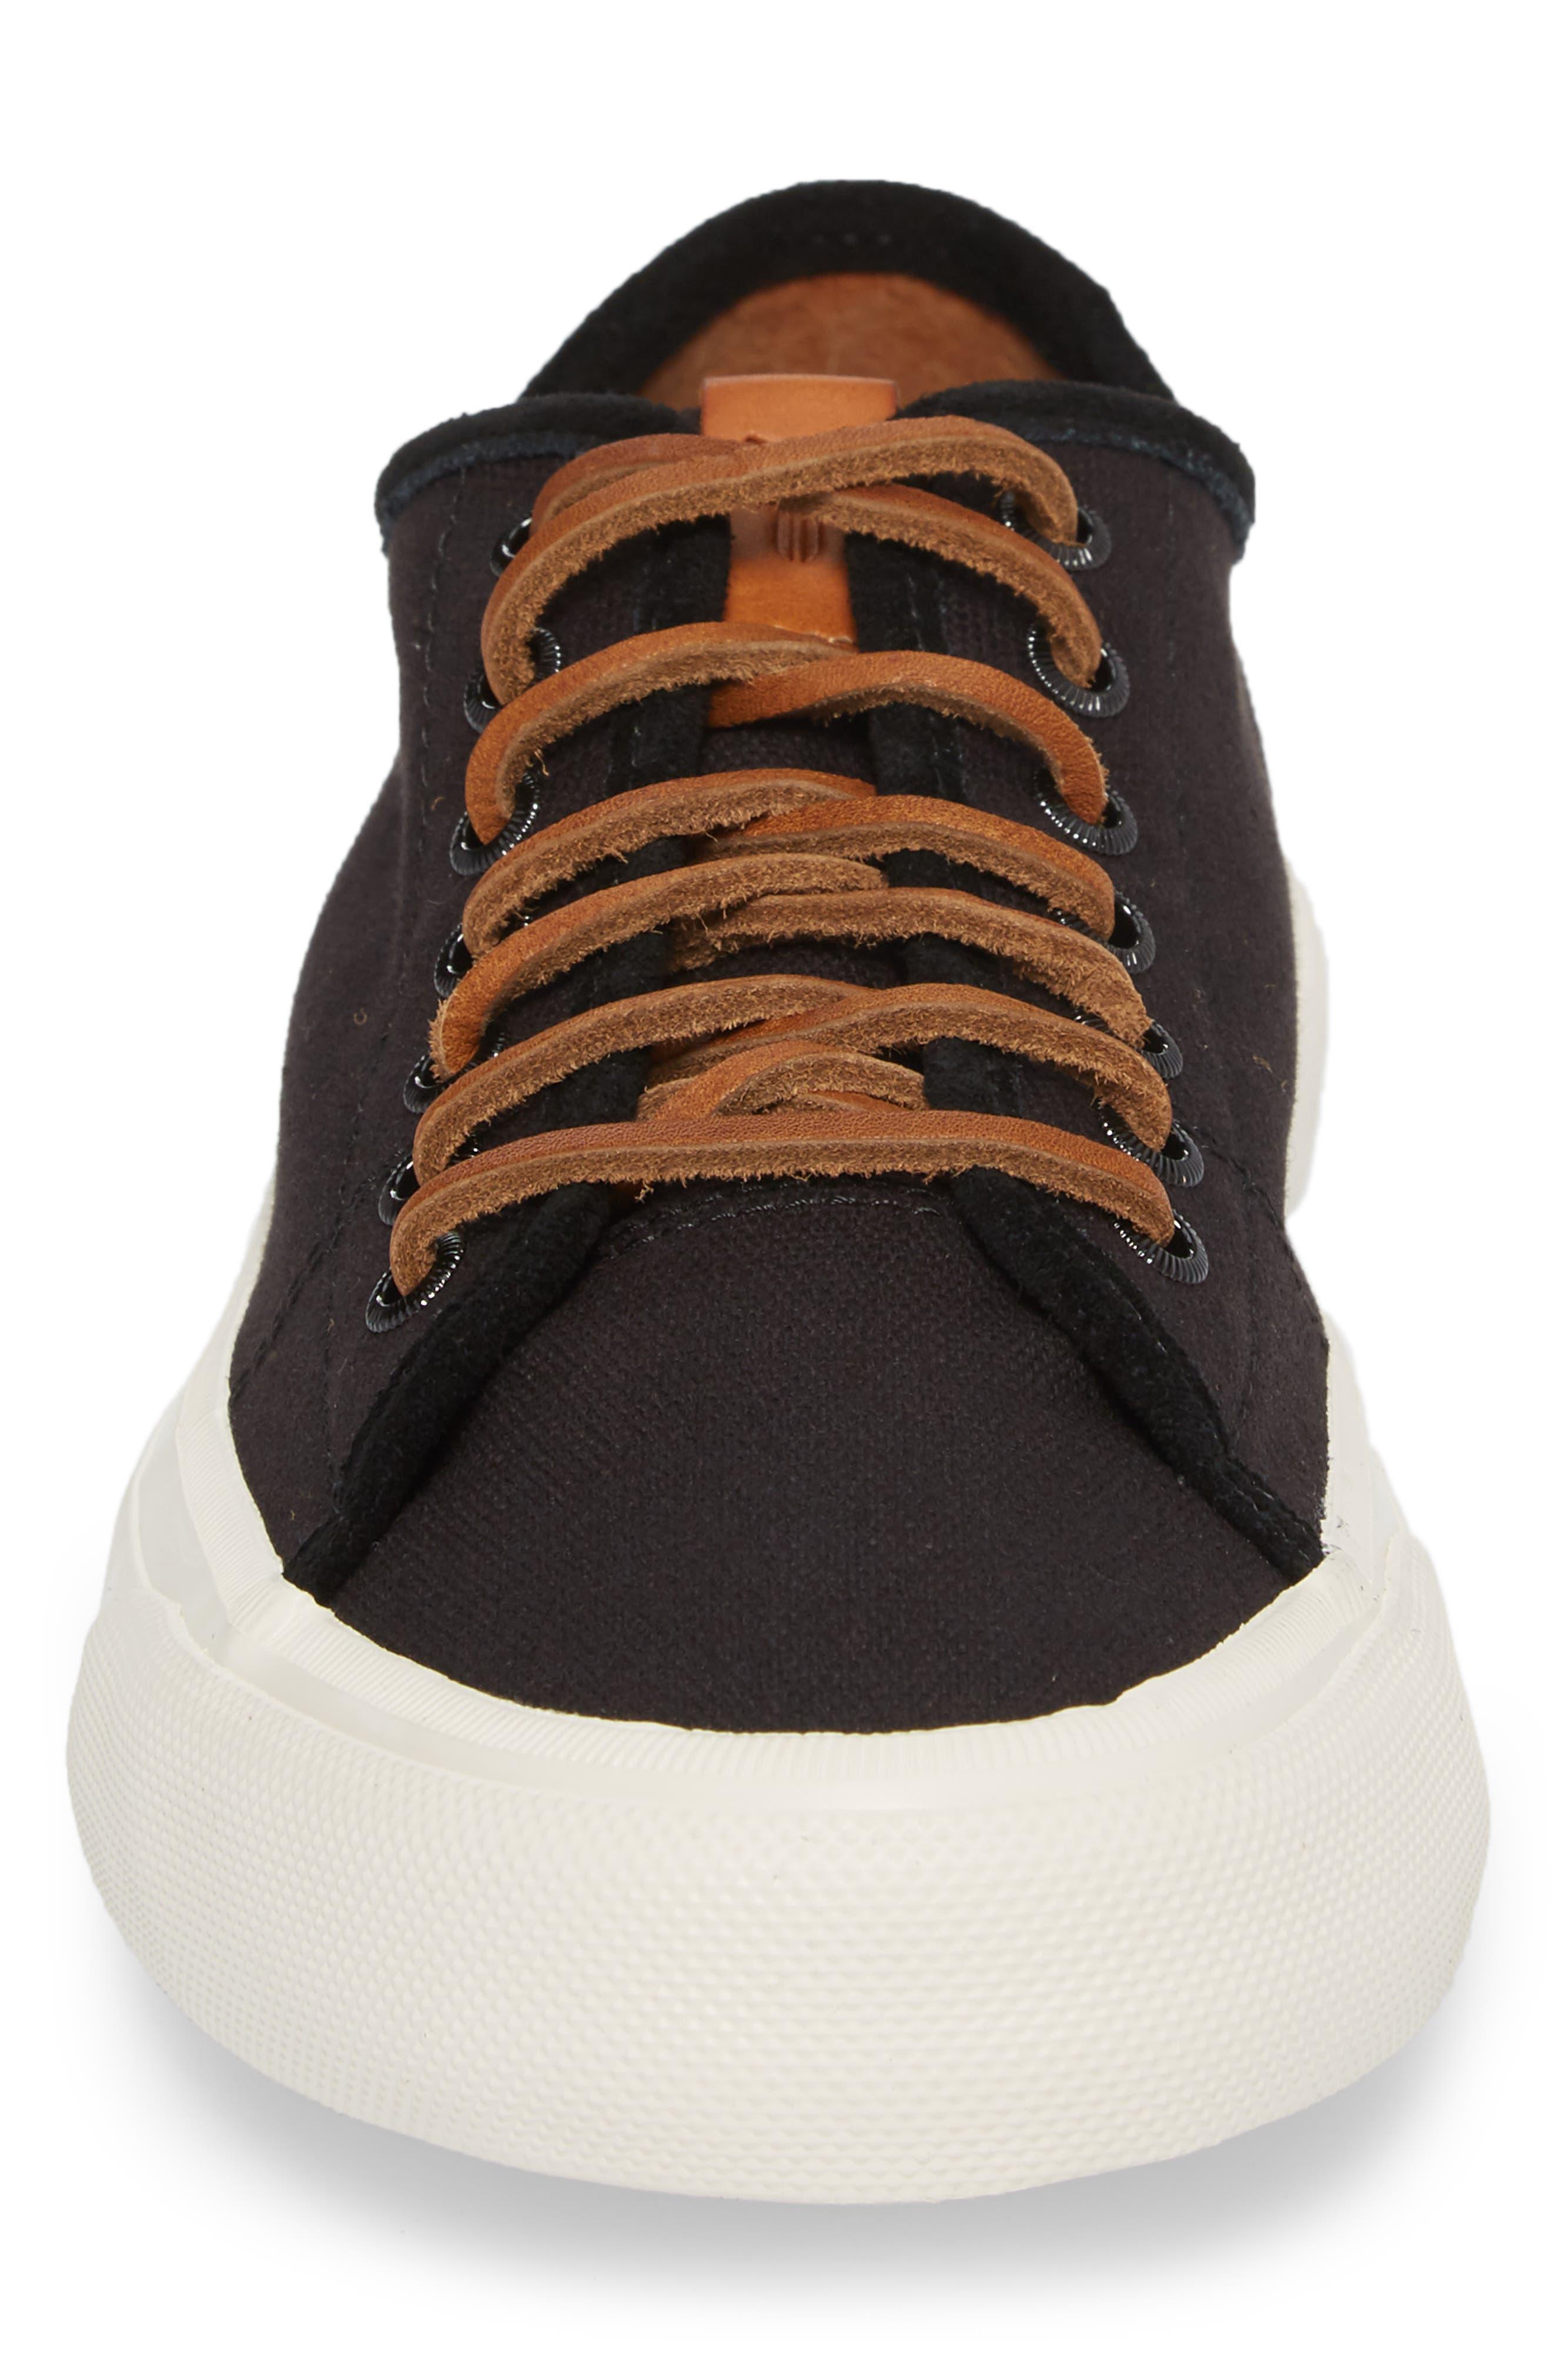 Ludlow Low Top Sneaker,                             Alternate thumbnail 4, color,                             001